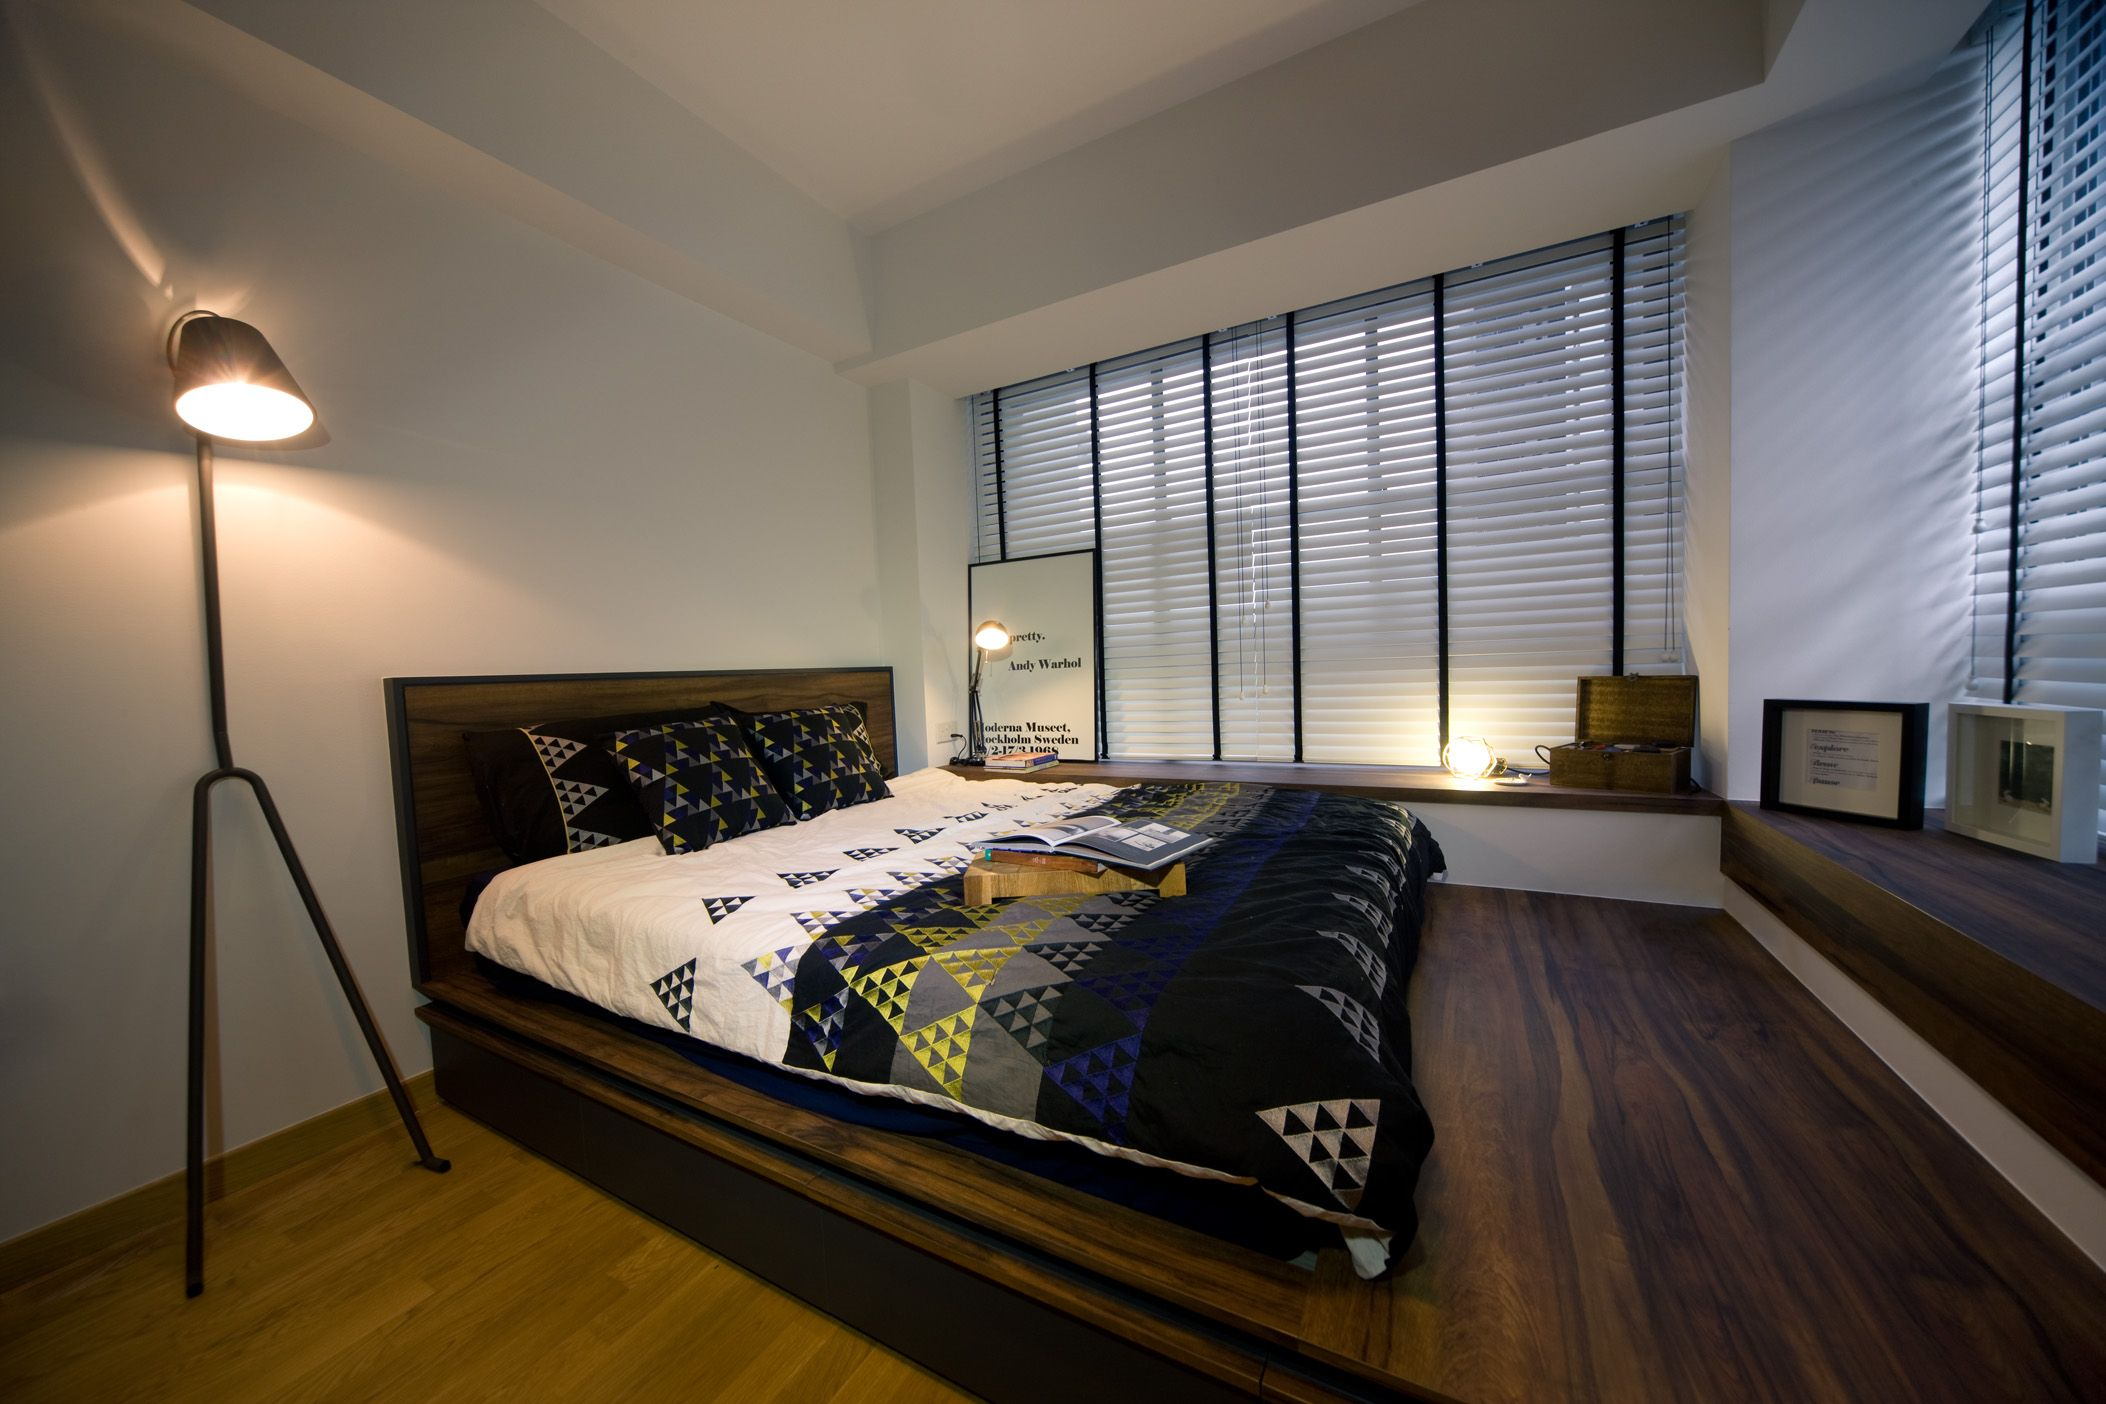 4 room bto master bedroom  The Peak  Project File  Industrial modern home  Pinterest